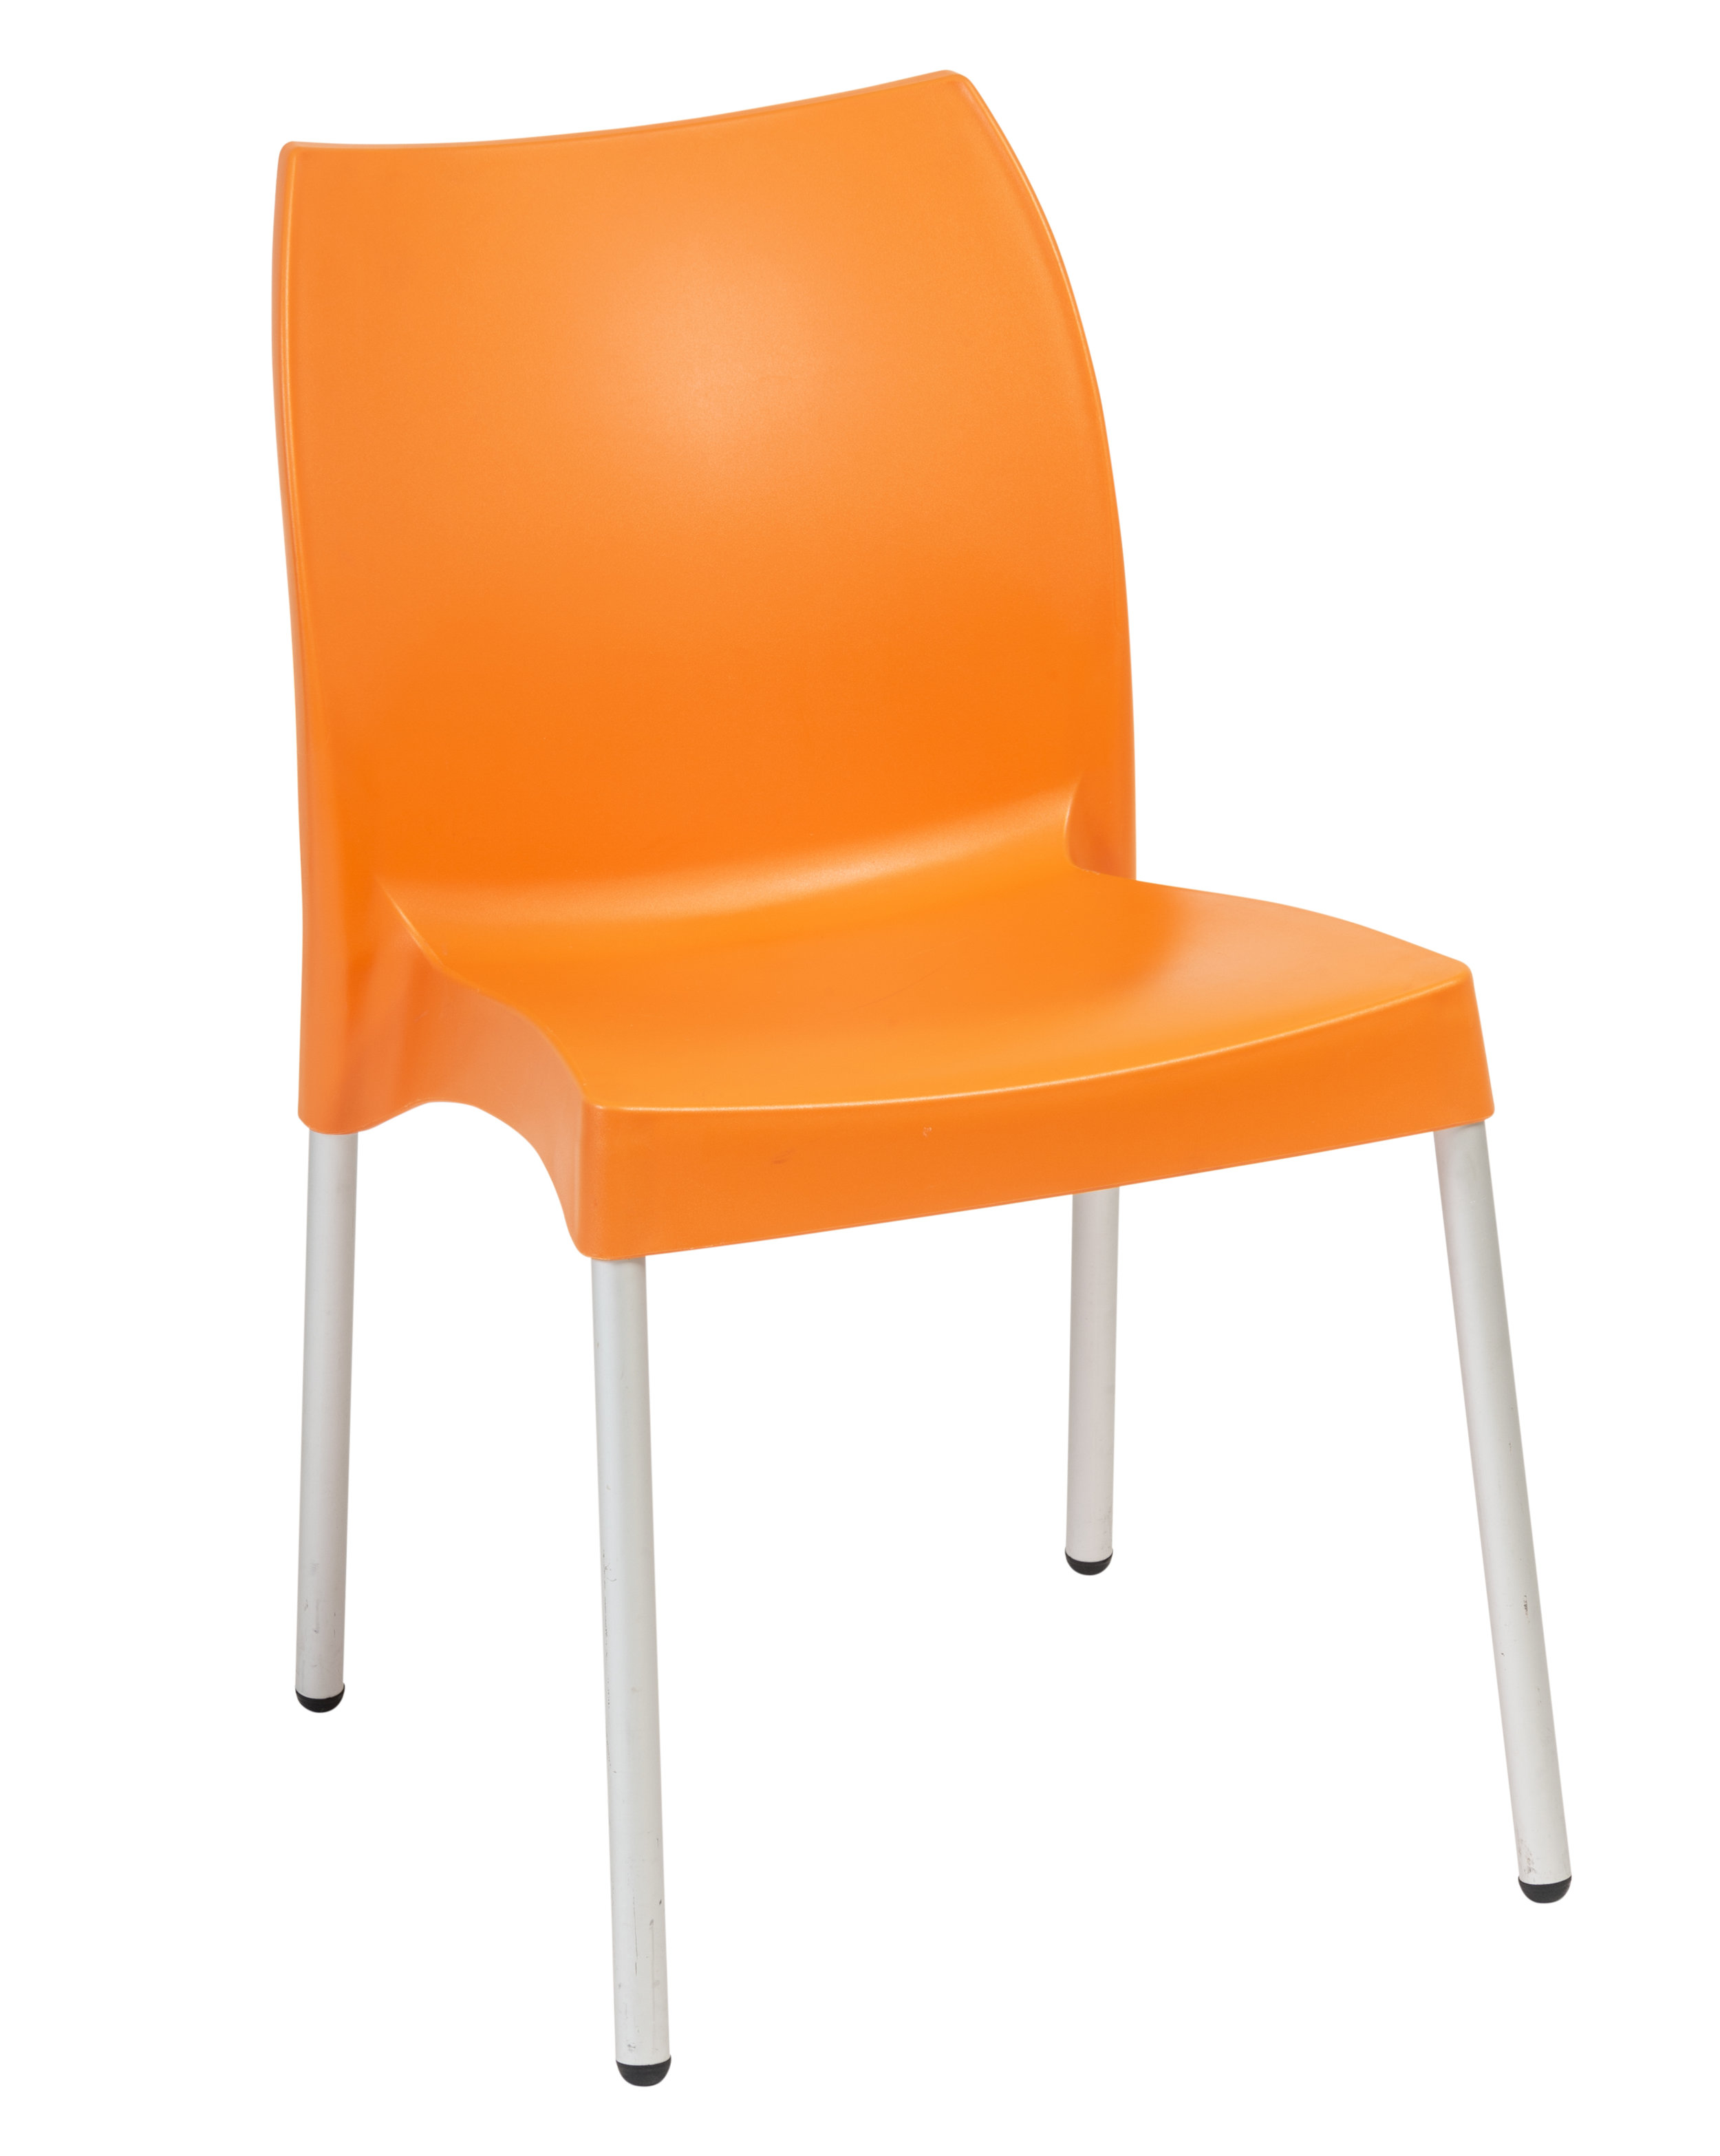 Domenica SC - Orange